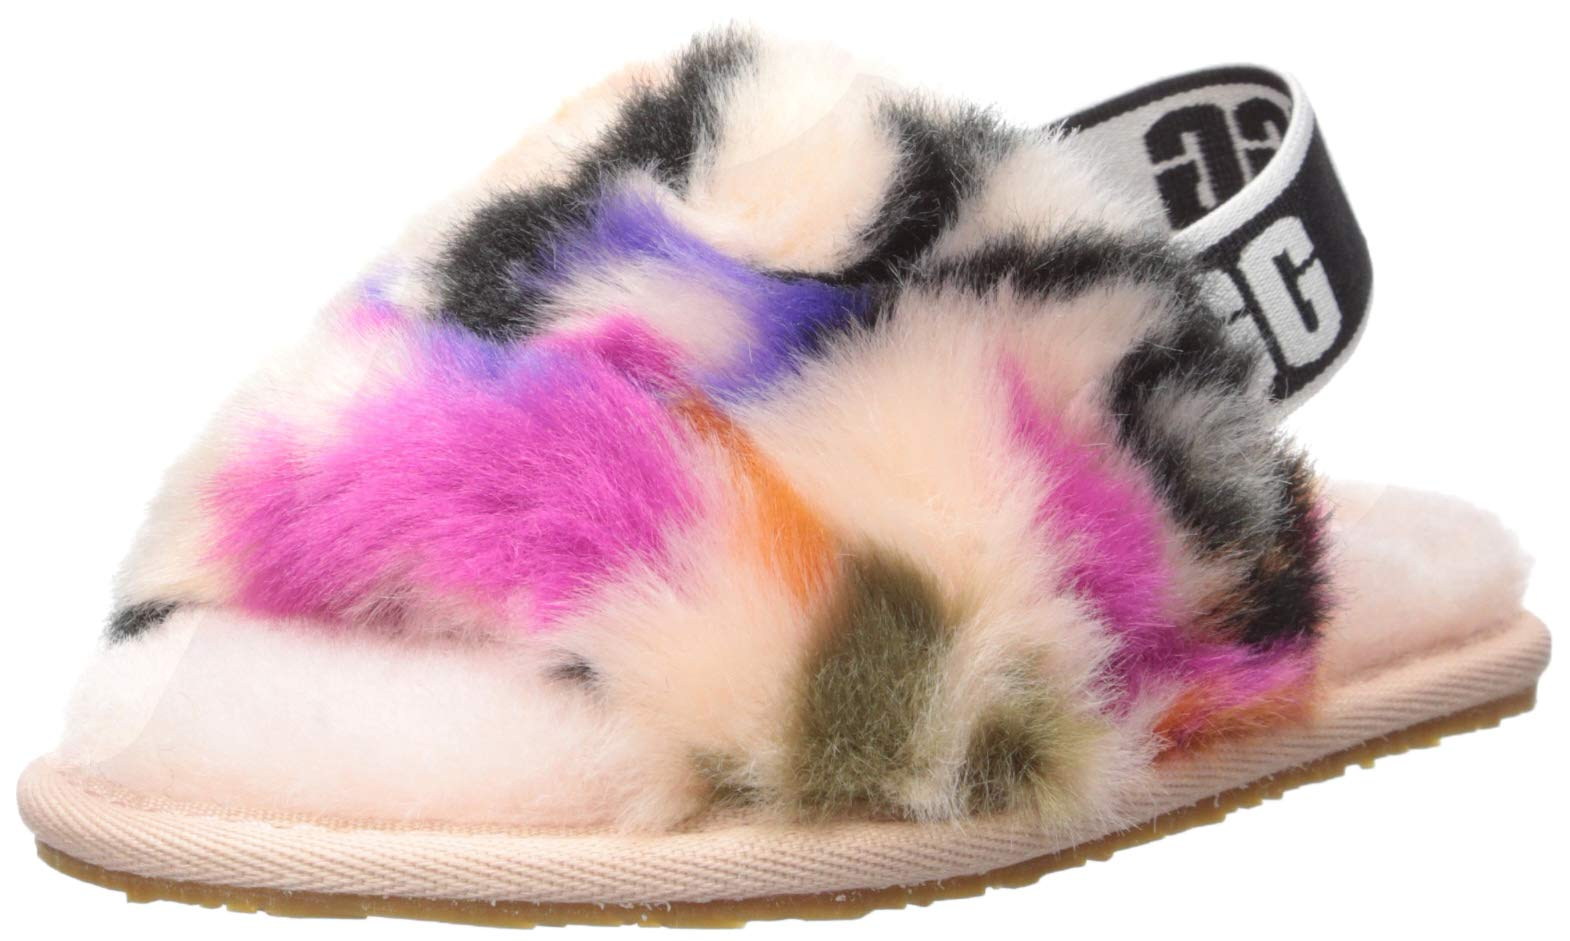 UGG Girls' Fluff Yeah Slide MOTLEE Flat Sandal, Multi, 6 M US Toddler by UGG